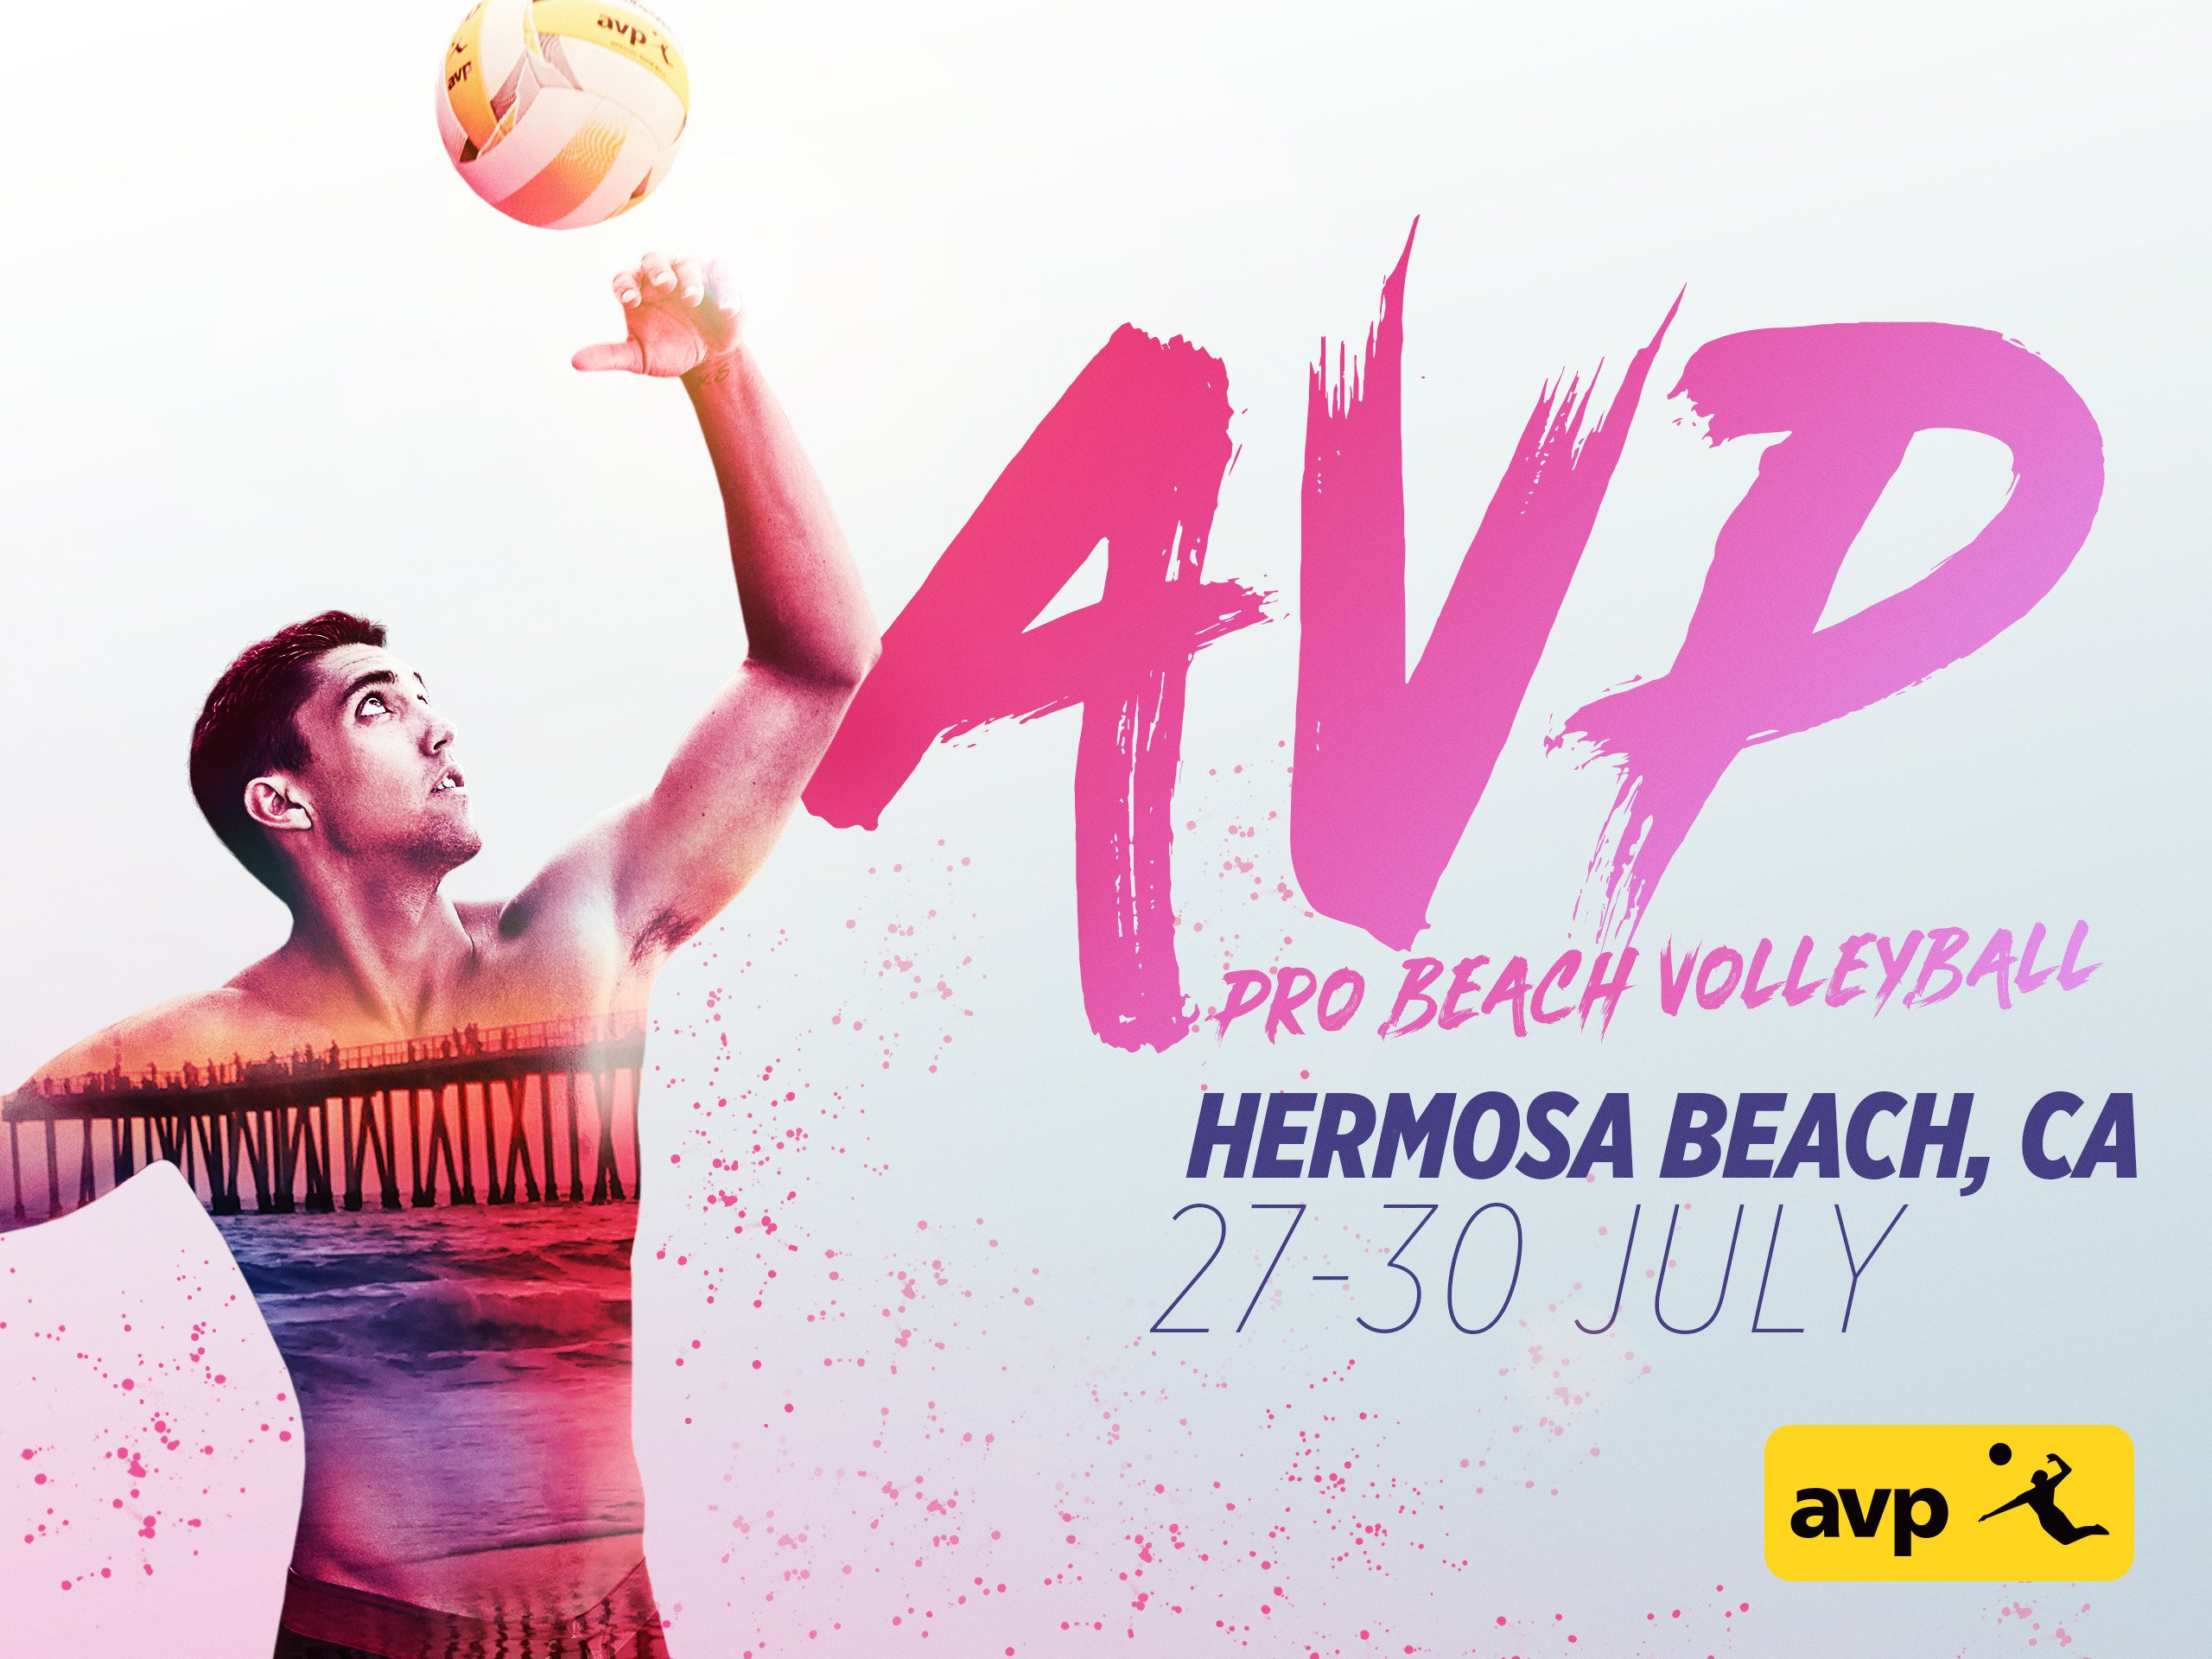 2018 AVP Hermosa Beach Open - Pro Beach Volleyball - 2018